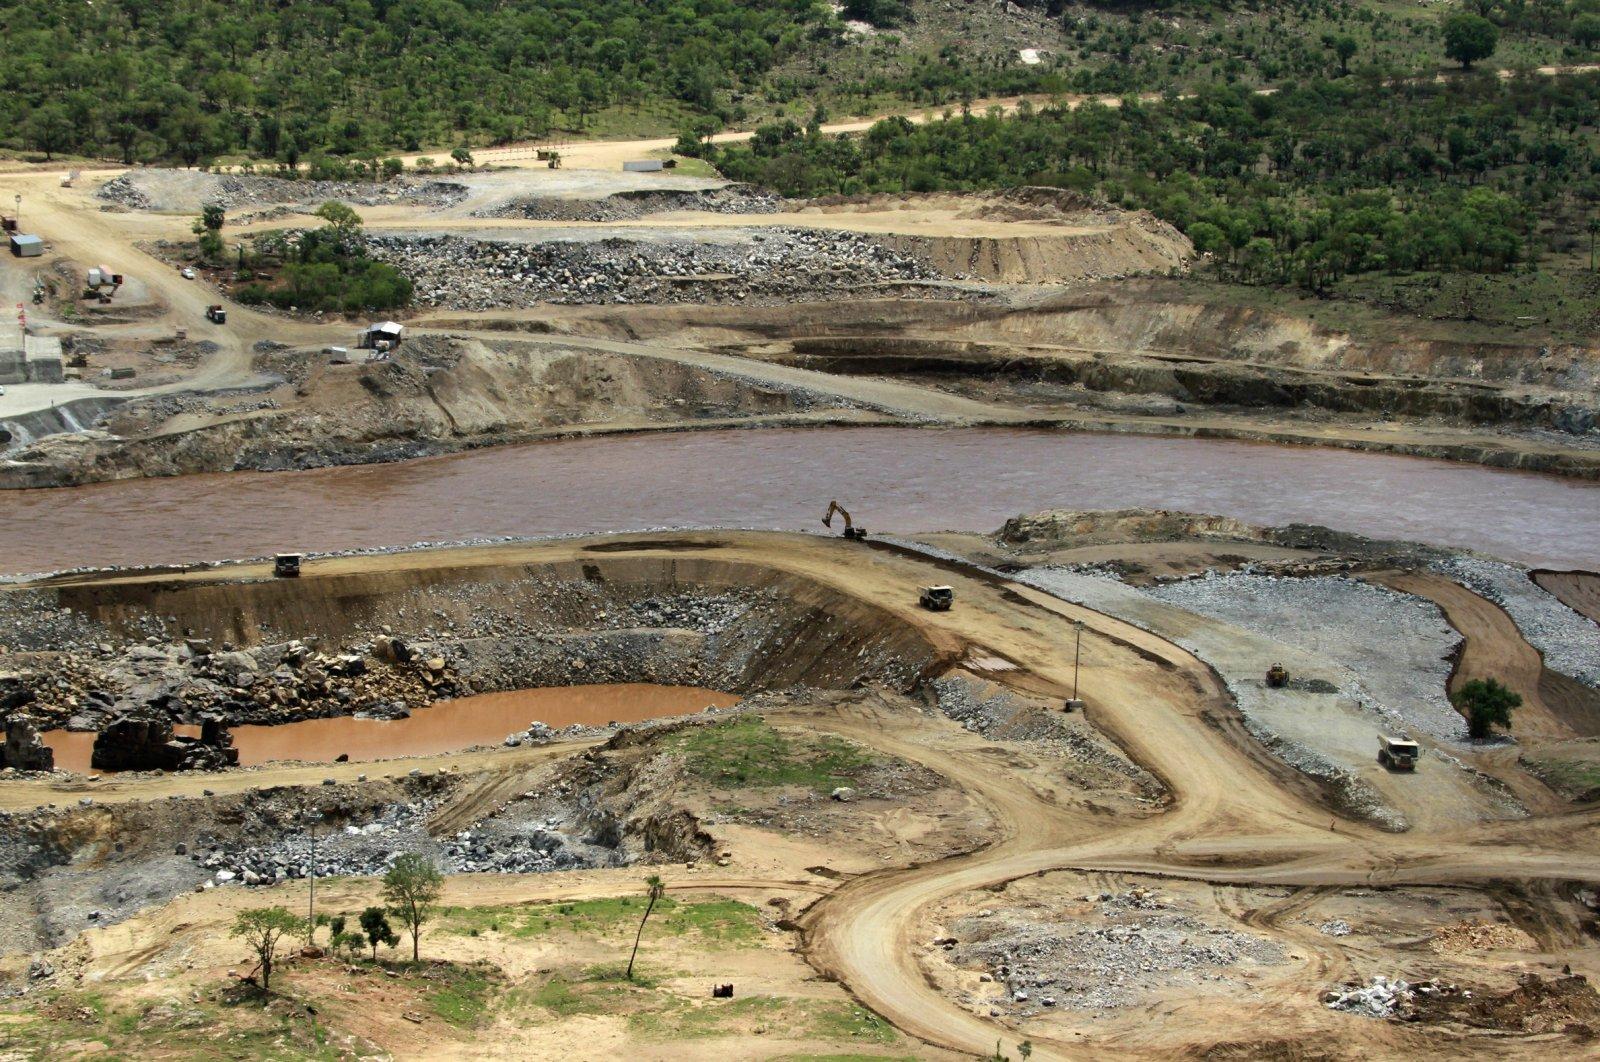 The Blue Nile river flows near the site of the planned Grand Ethiopian Renaissance Dam near Assosa in the Benishangul-Gumuz region of Ethiopia, June 28, 2013. (AP Photo)